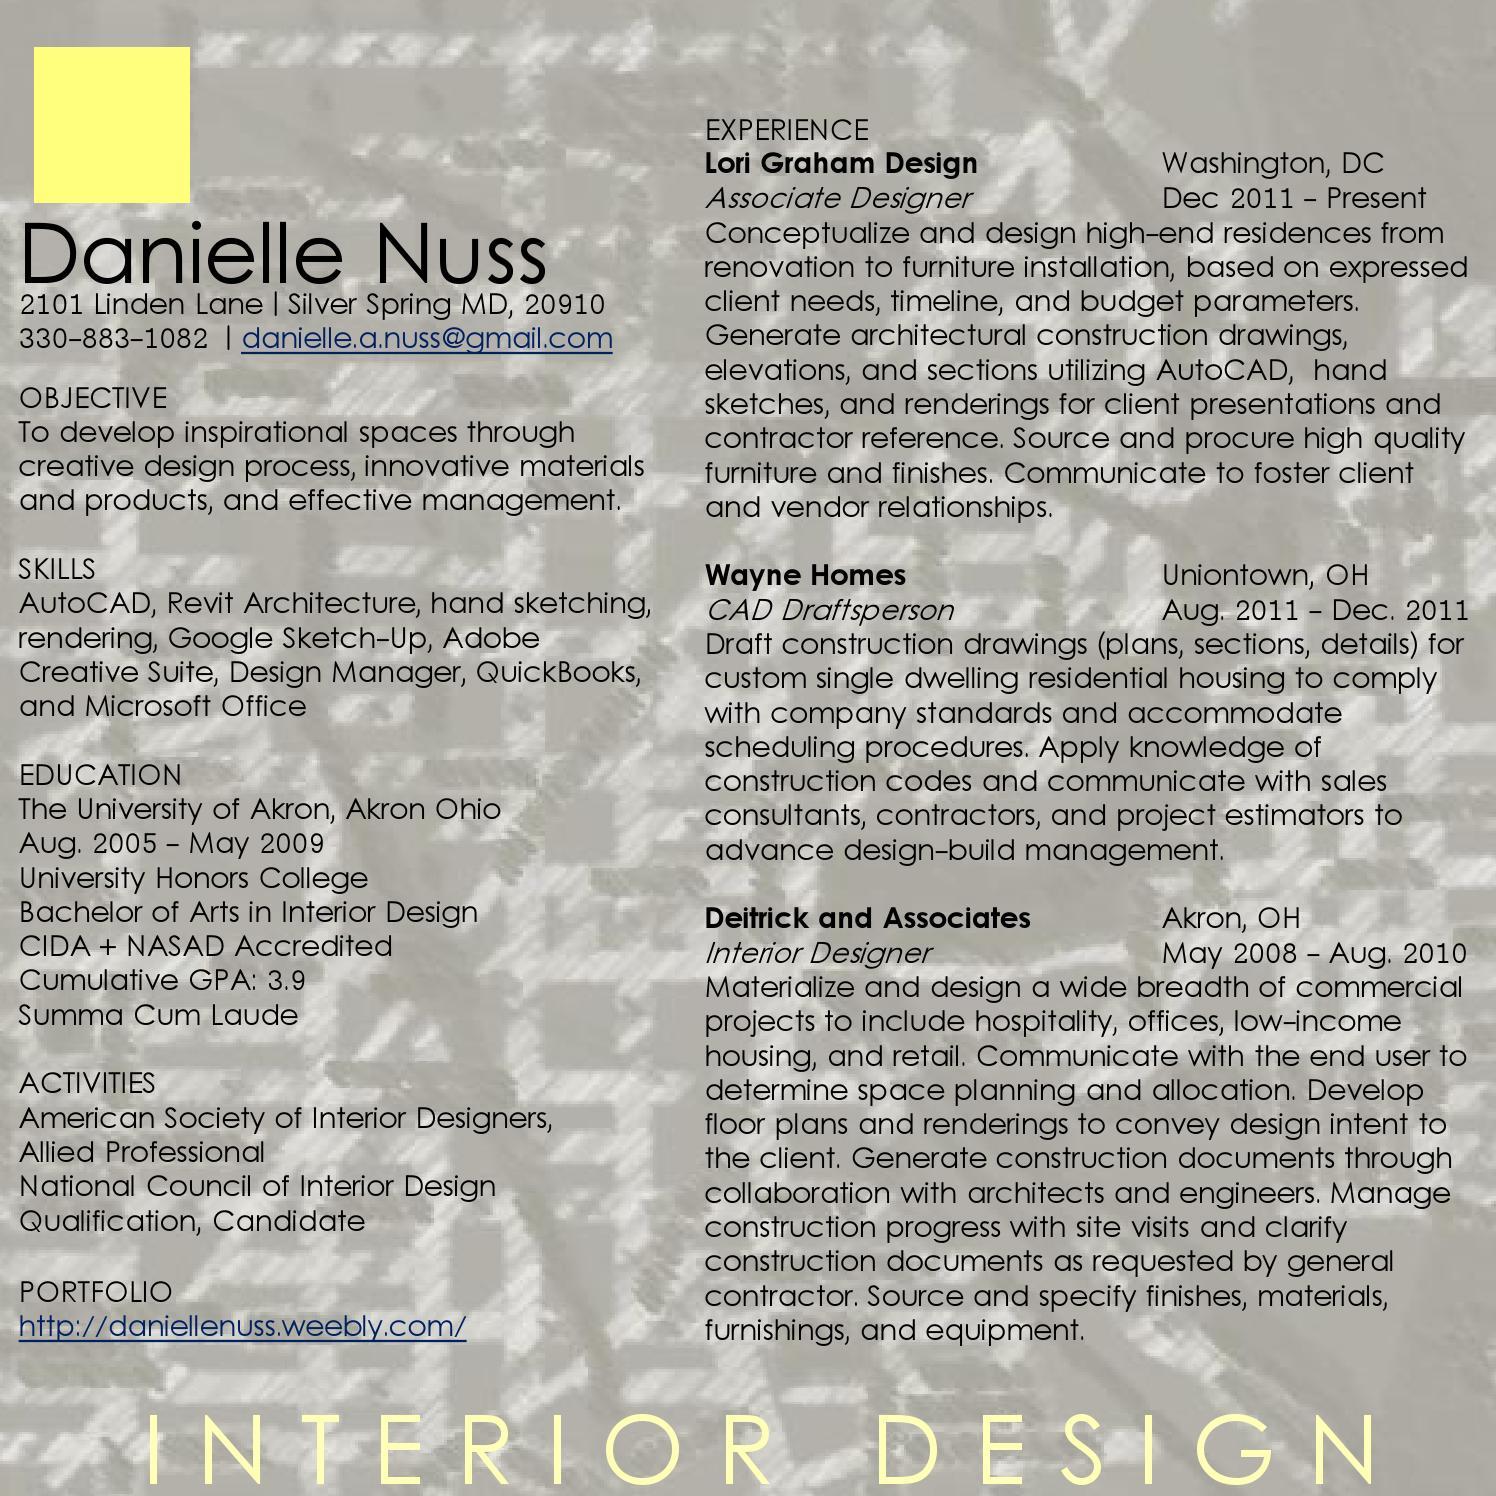 danielle nuss - resume by danielle nuss